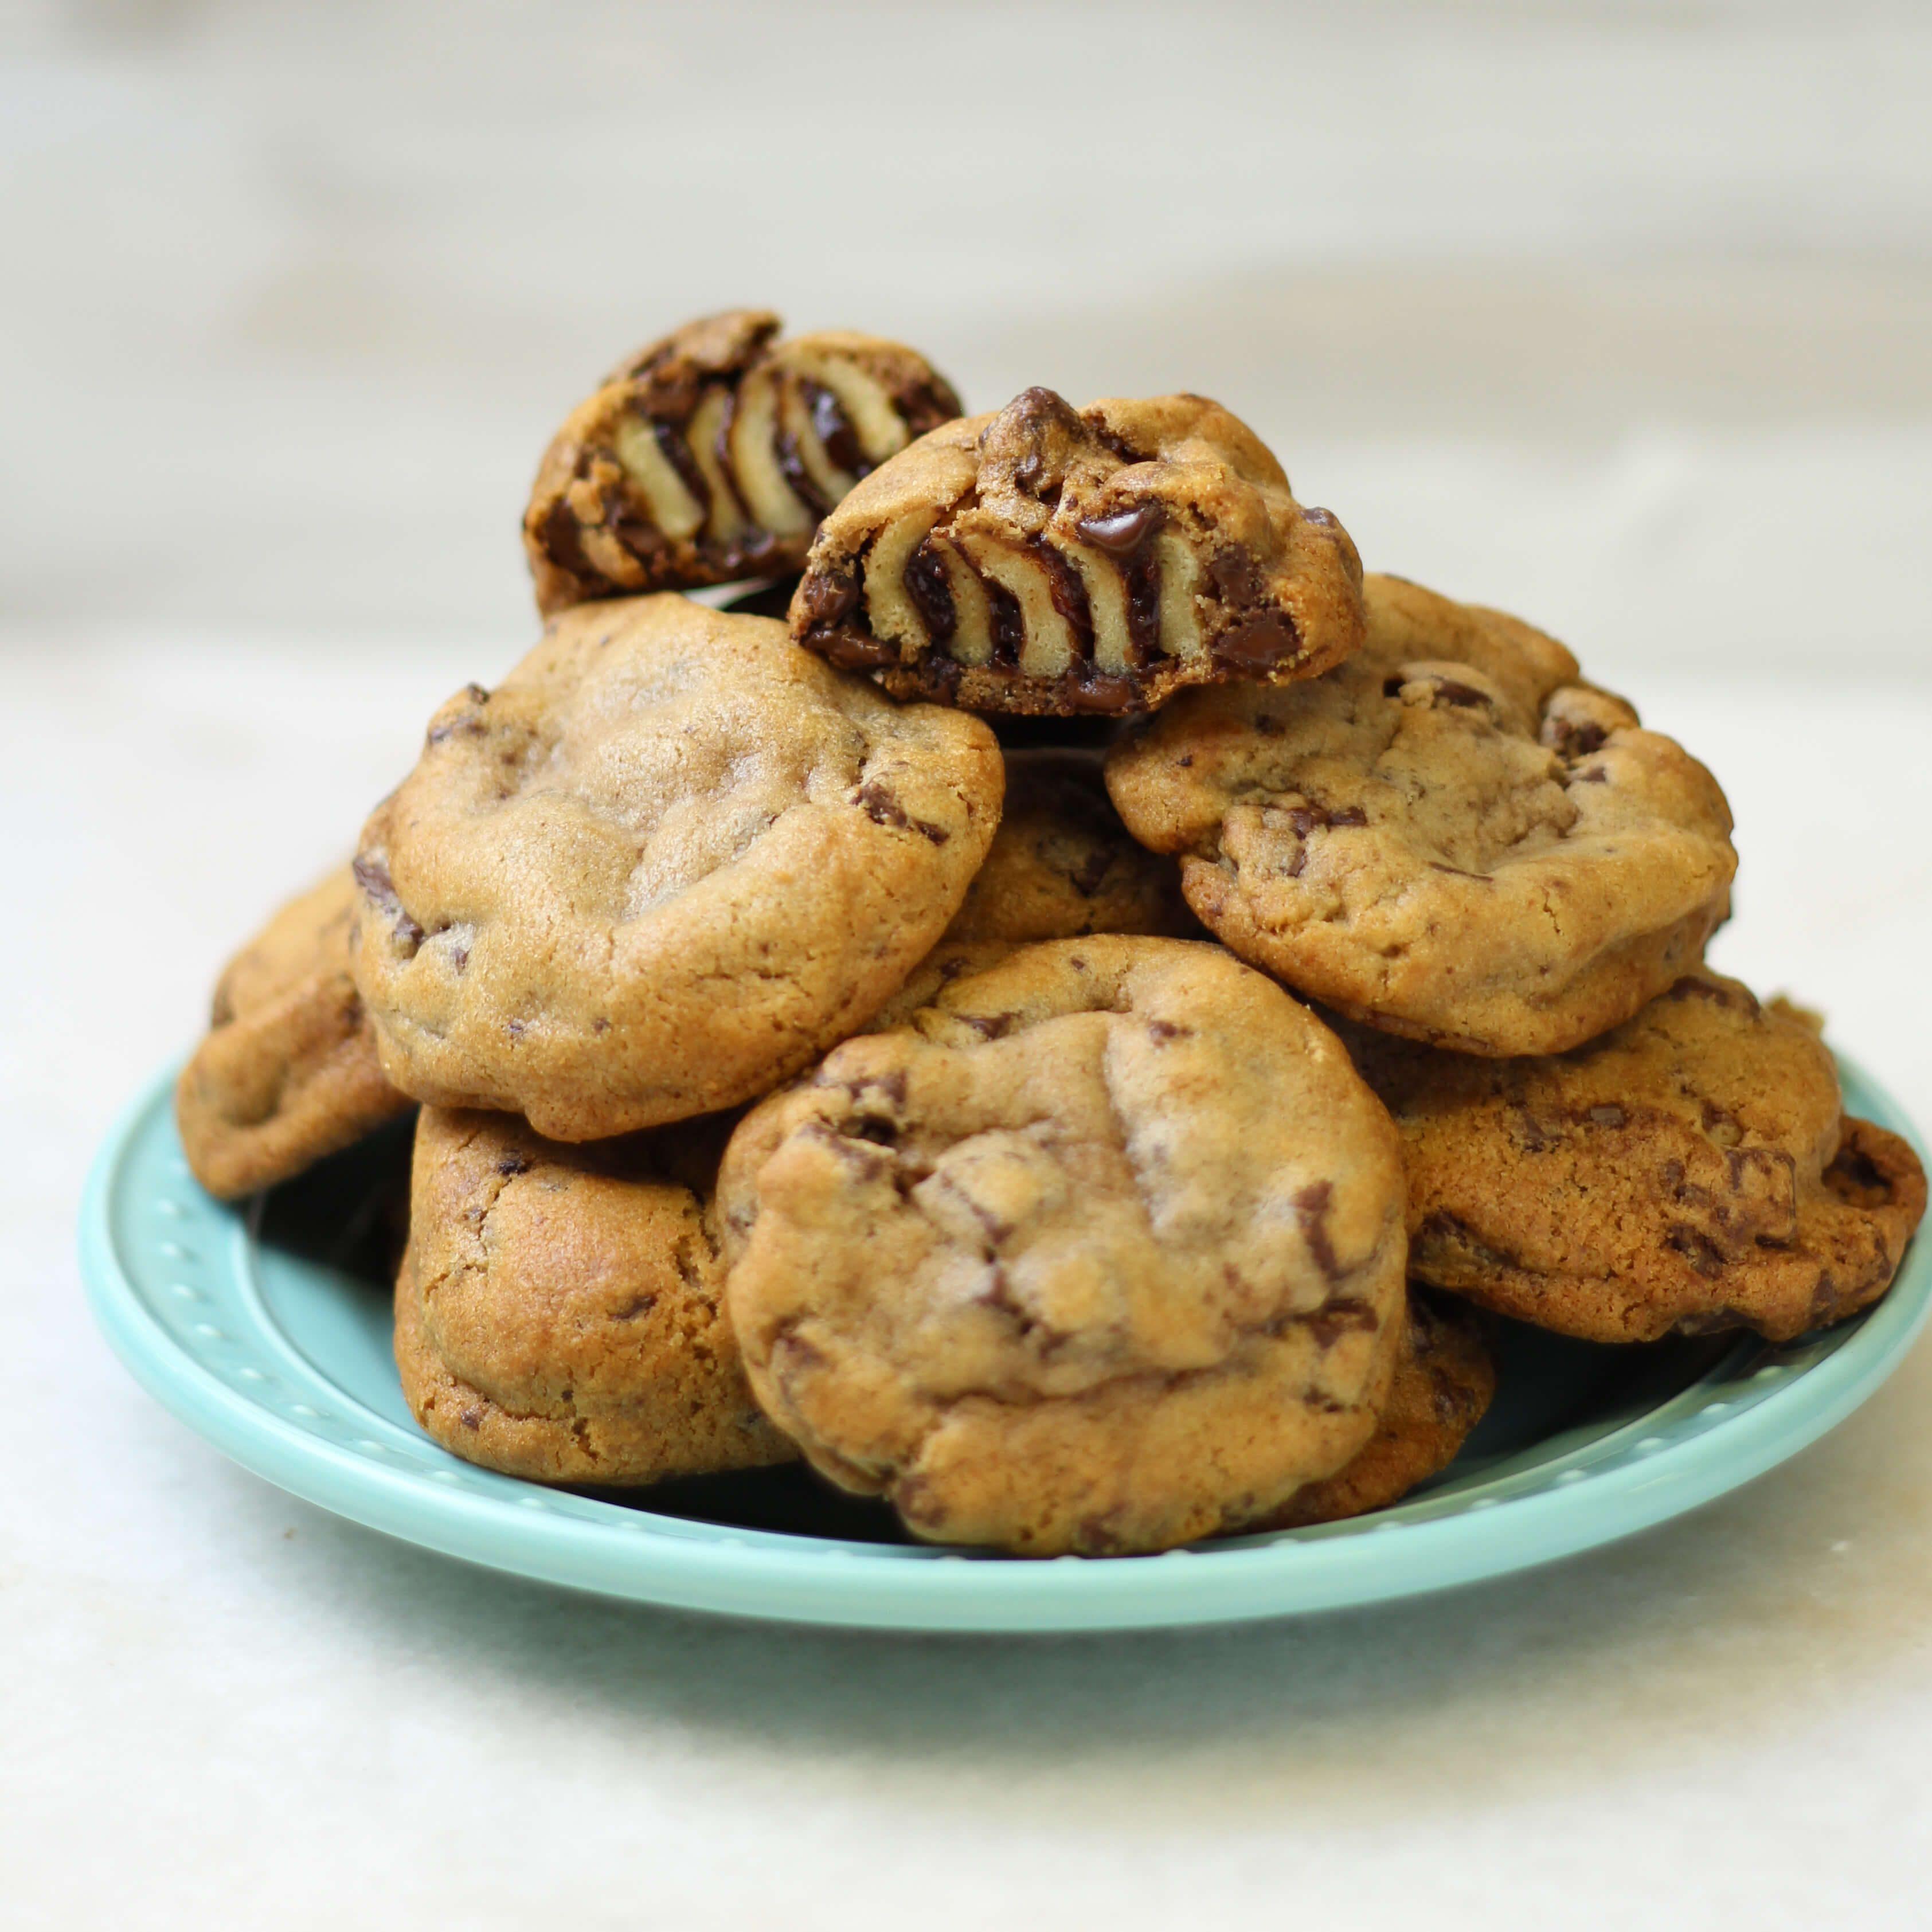 The new Cookie BonBite from Cinnabon